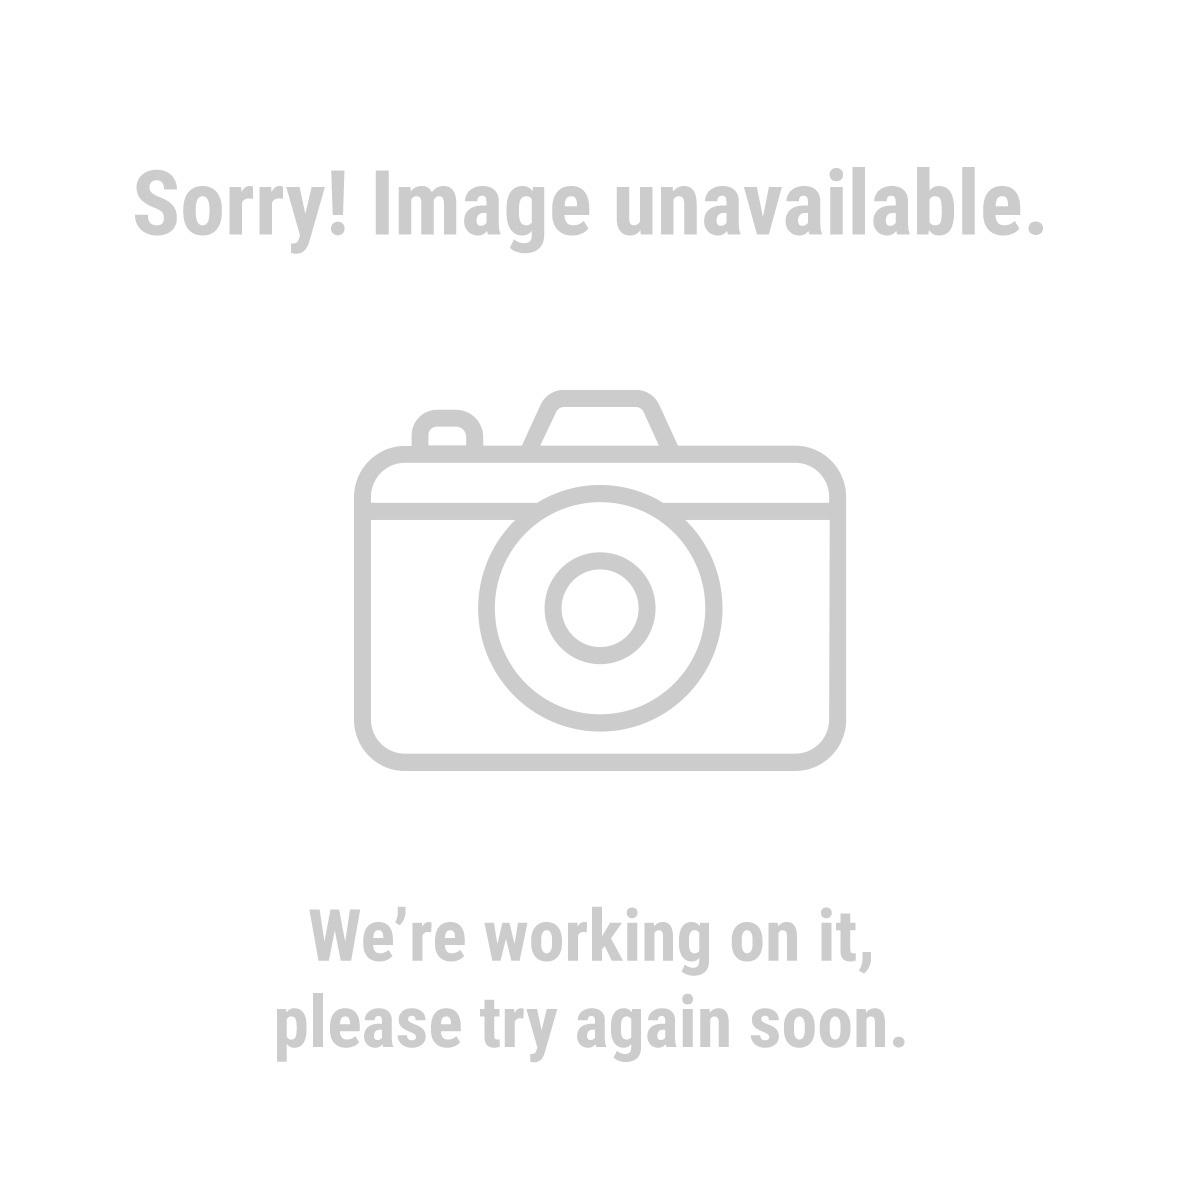 "HFT 68358 4 Rolls 2"" x 60 Yards Blue Painter's Tape"